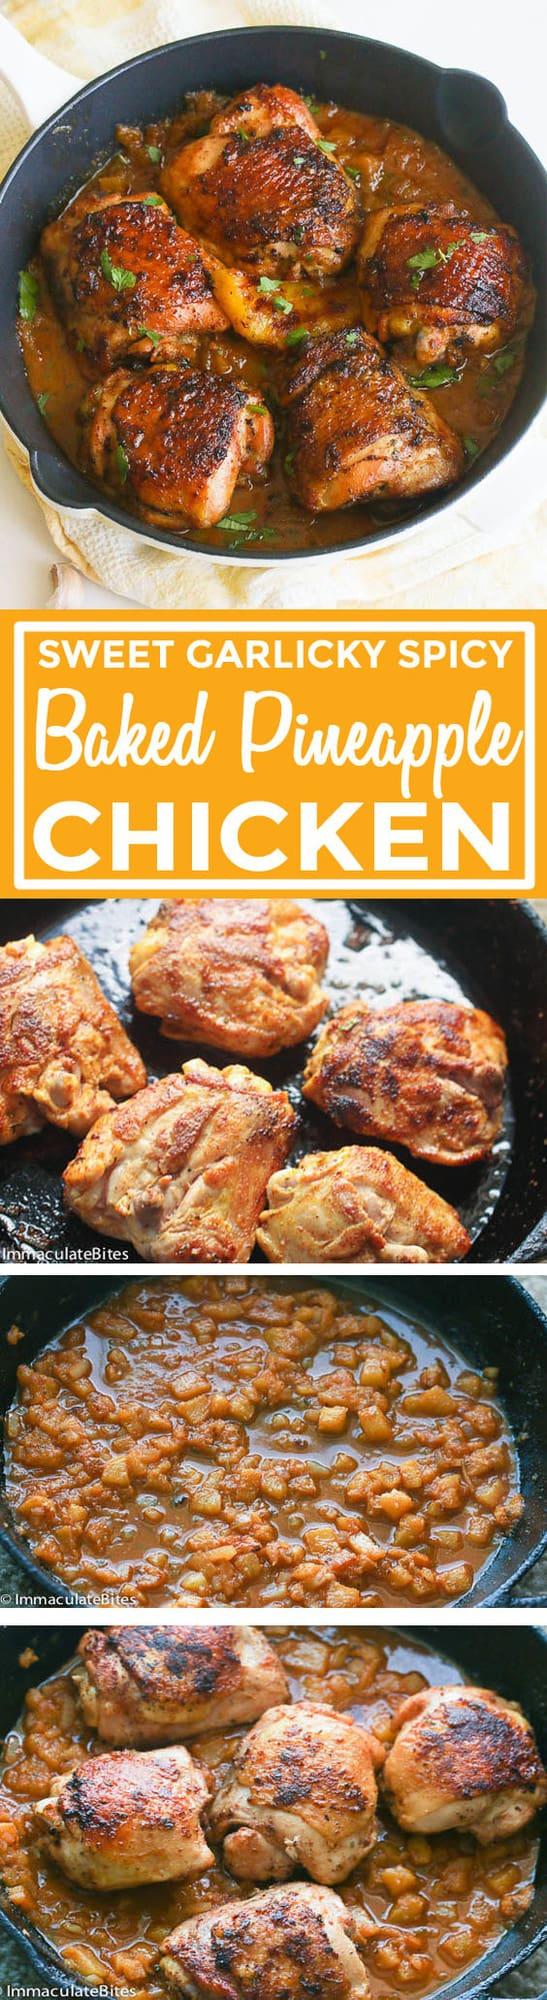 Baked Pineapple Chicken